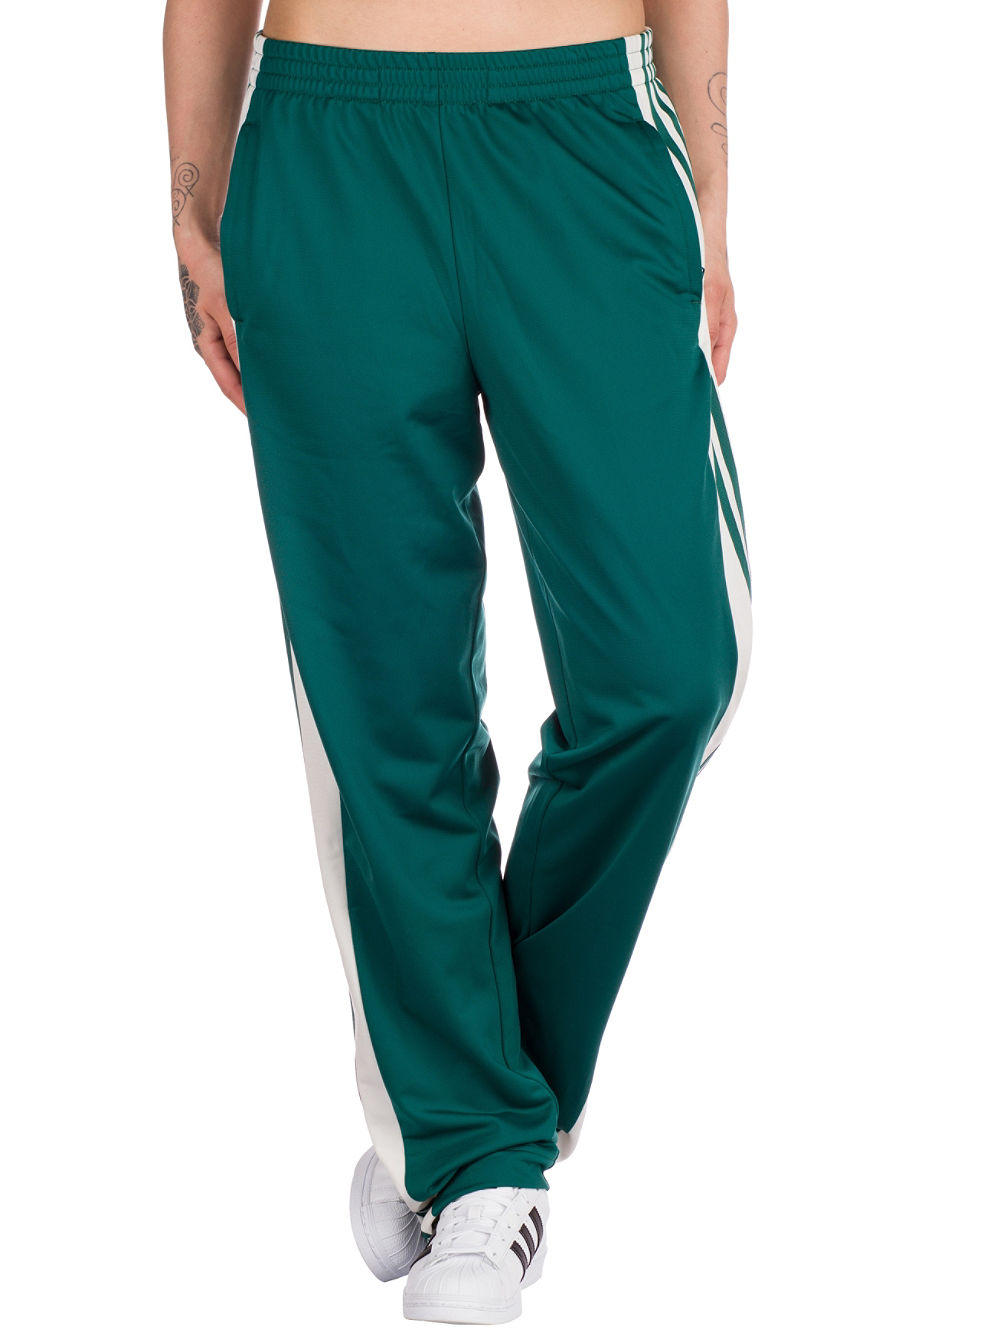 b7e69692f25 Buy adidas Originals Adibreak Track Jogging Pants online at Blue Tomato